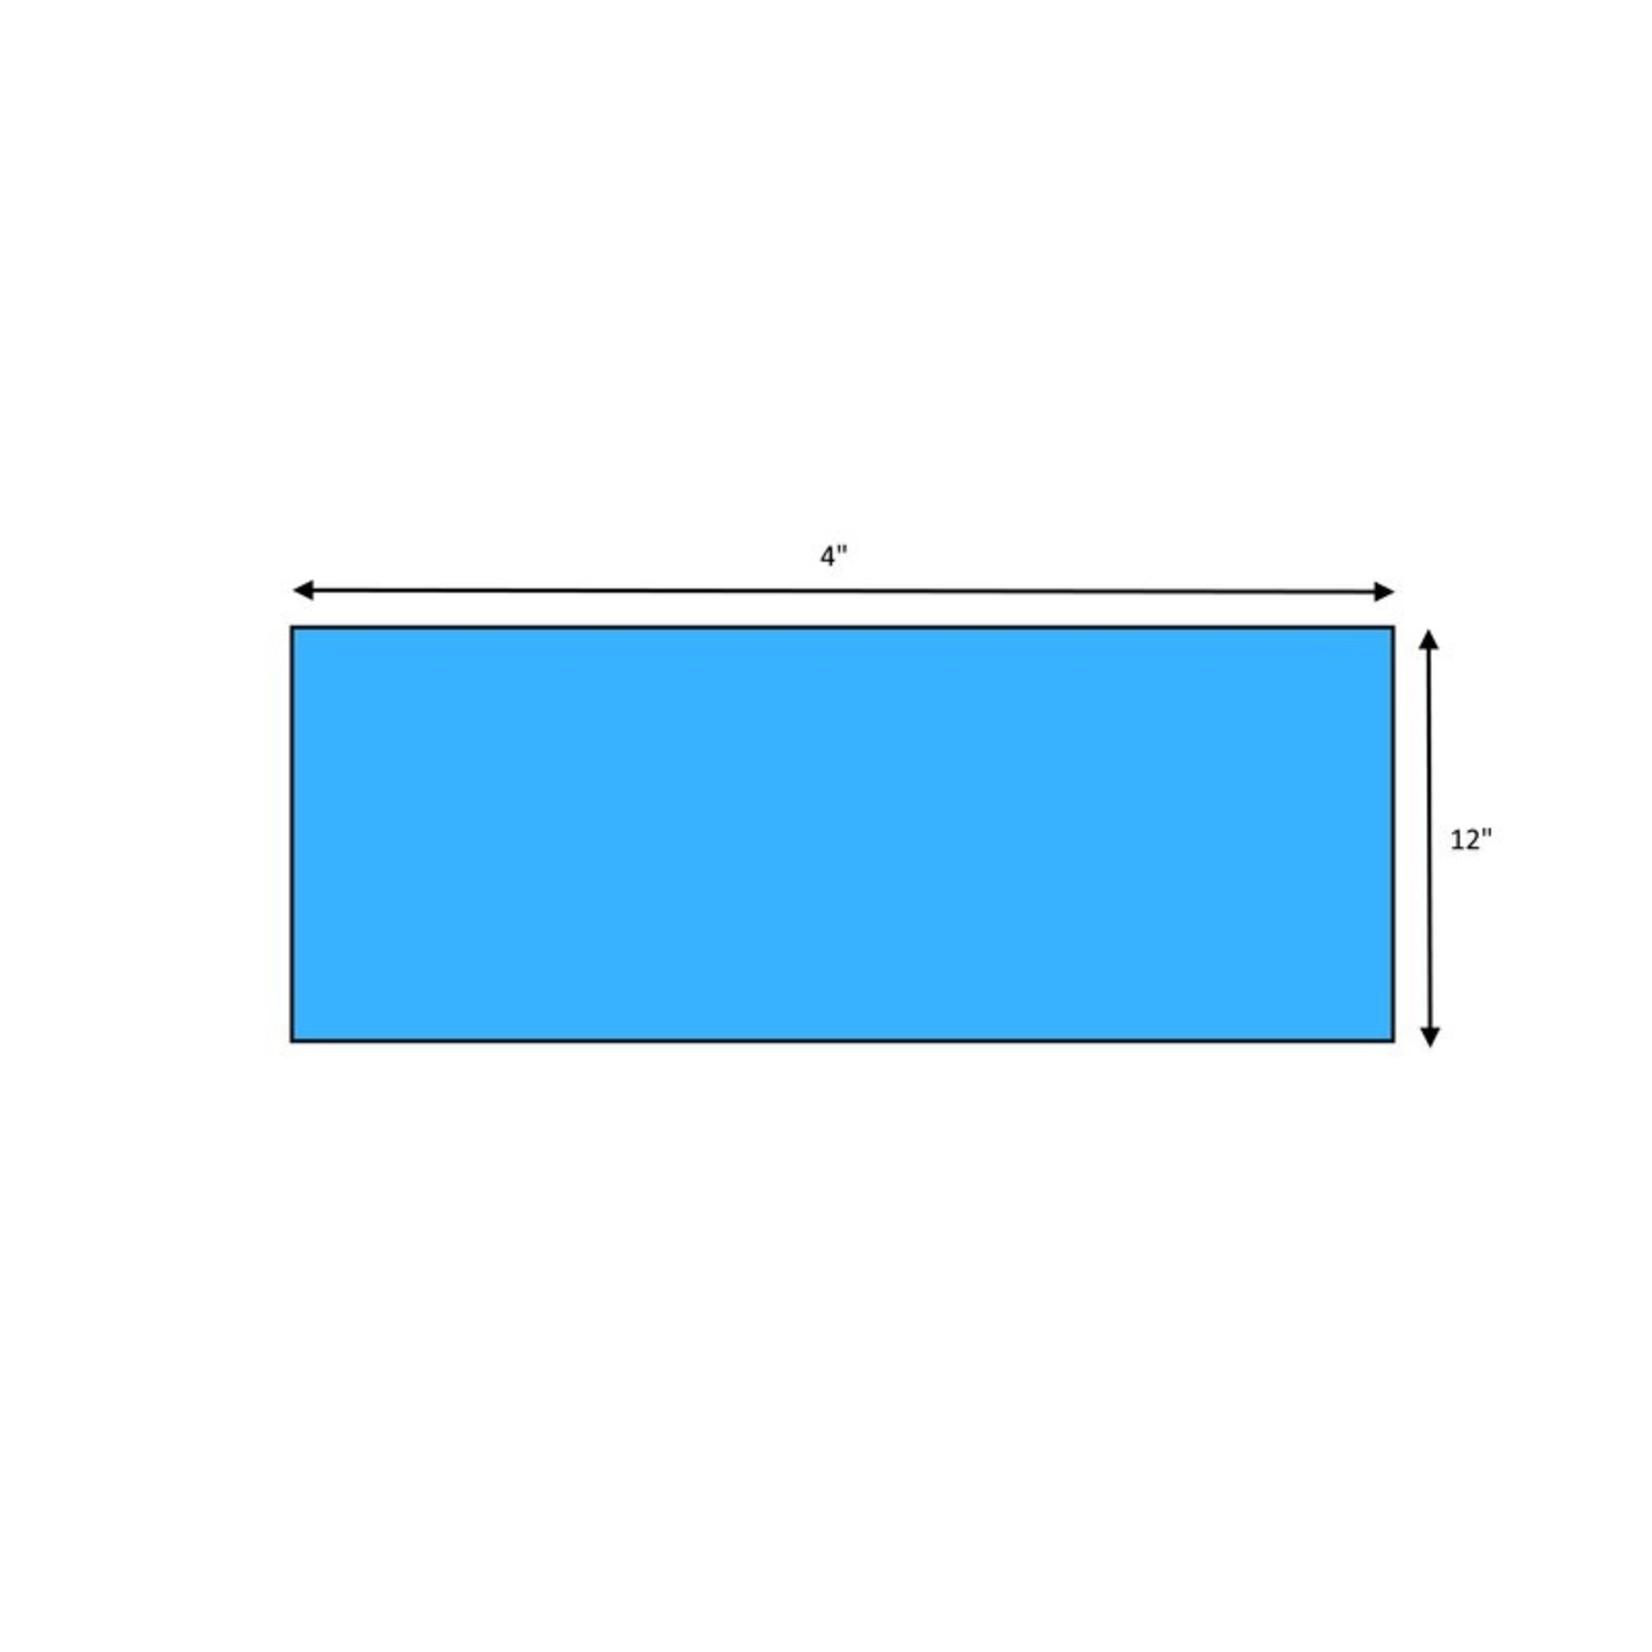 "*Premium 4"" x 12"" Glass Subway Tile - Aqua - Set of 15"